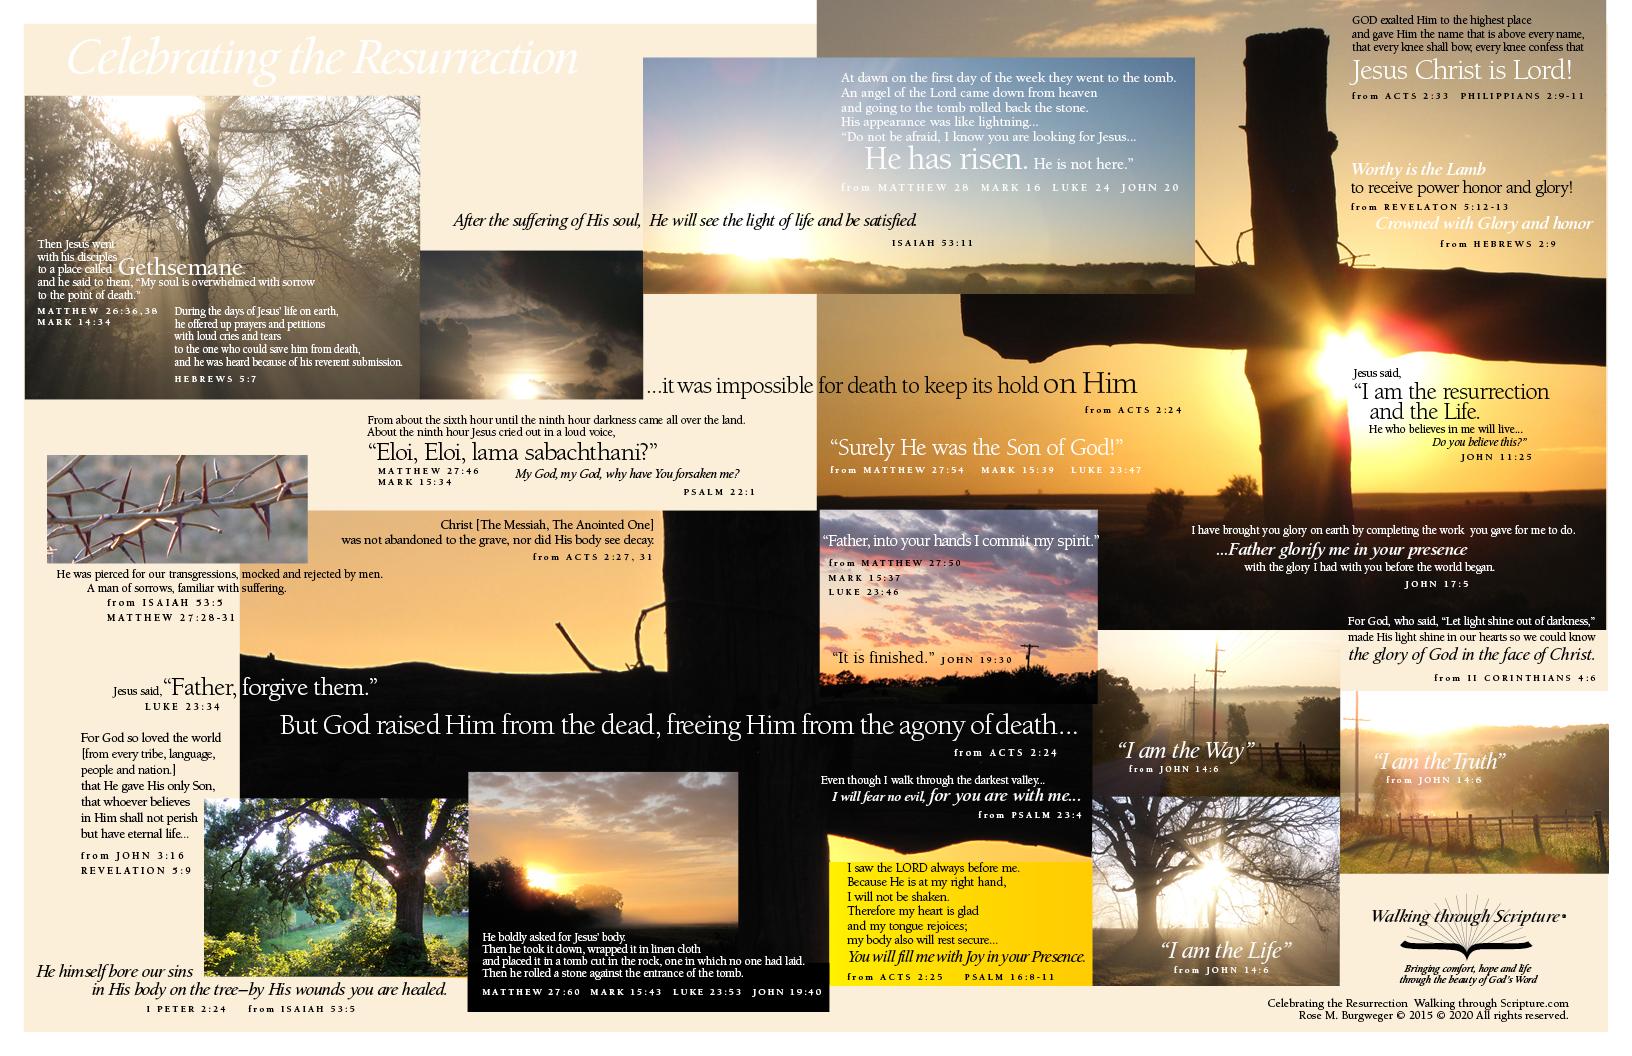 Celebrating the Resurrection RMB prints